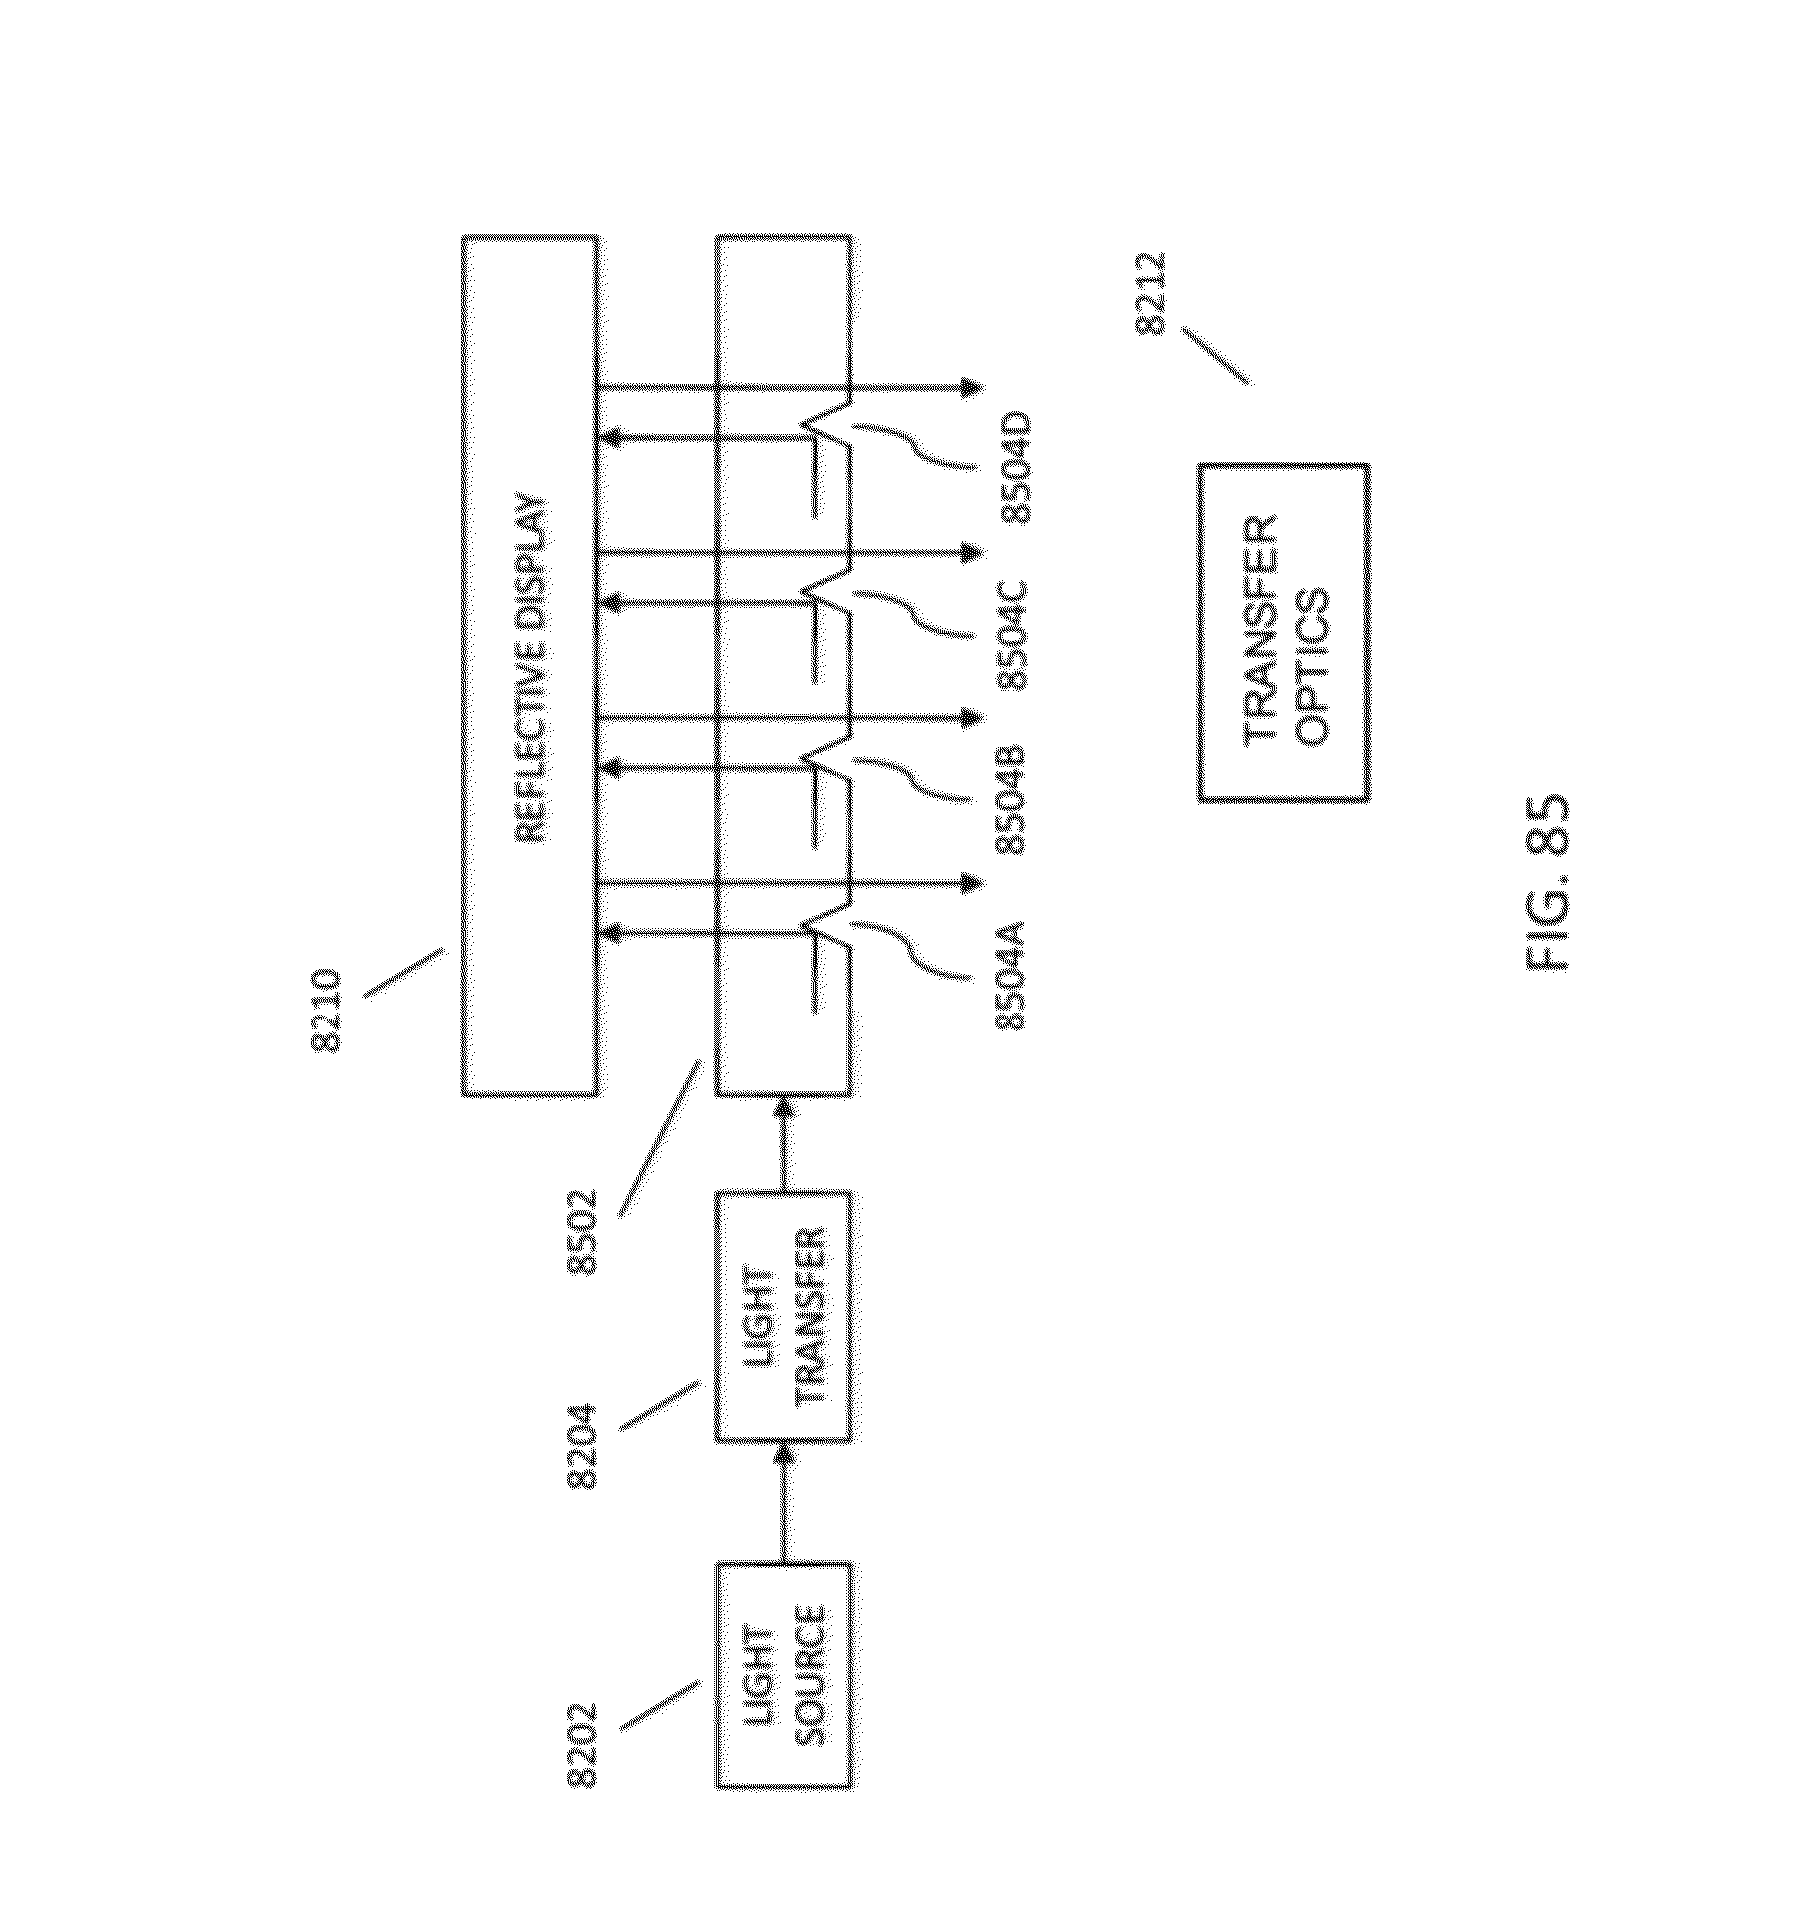 mitsubishi dlp optical engine diagram best wiring librarypatent images  patent us 8,482,859 b2 patent images mitsubishi